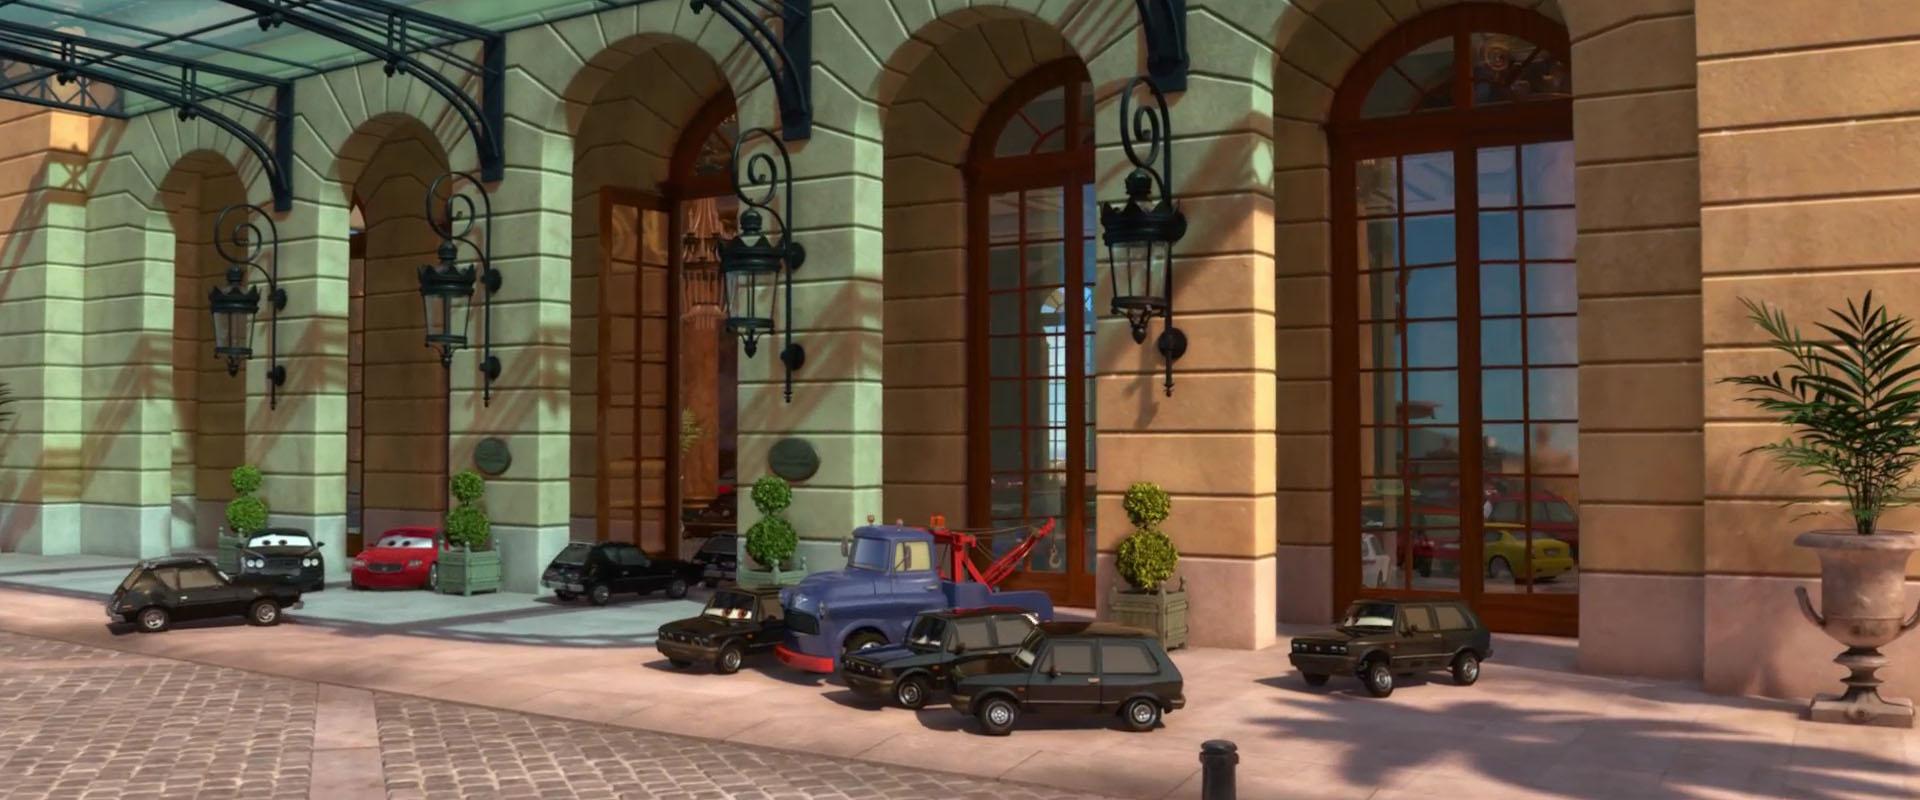 carlo-maserati-personnage-cars-2-01